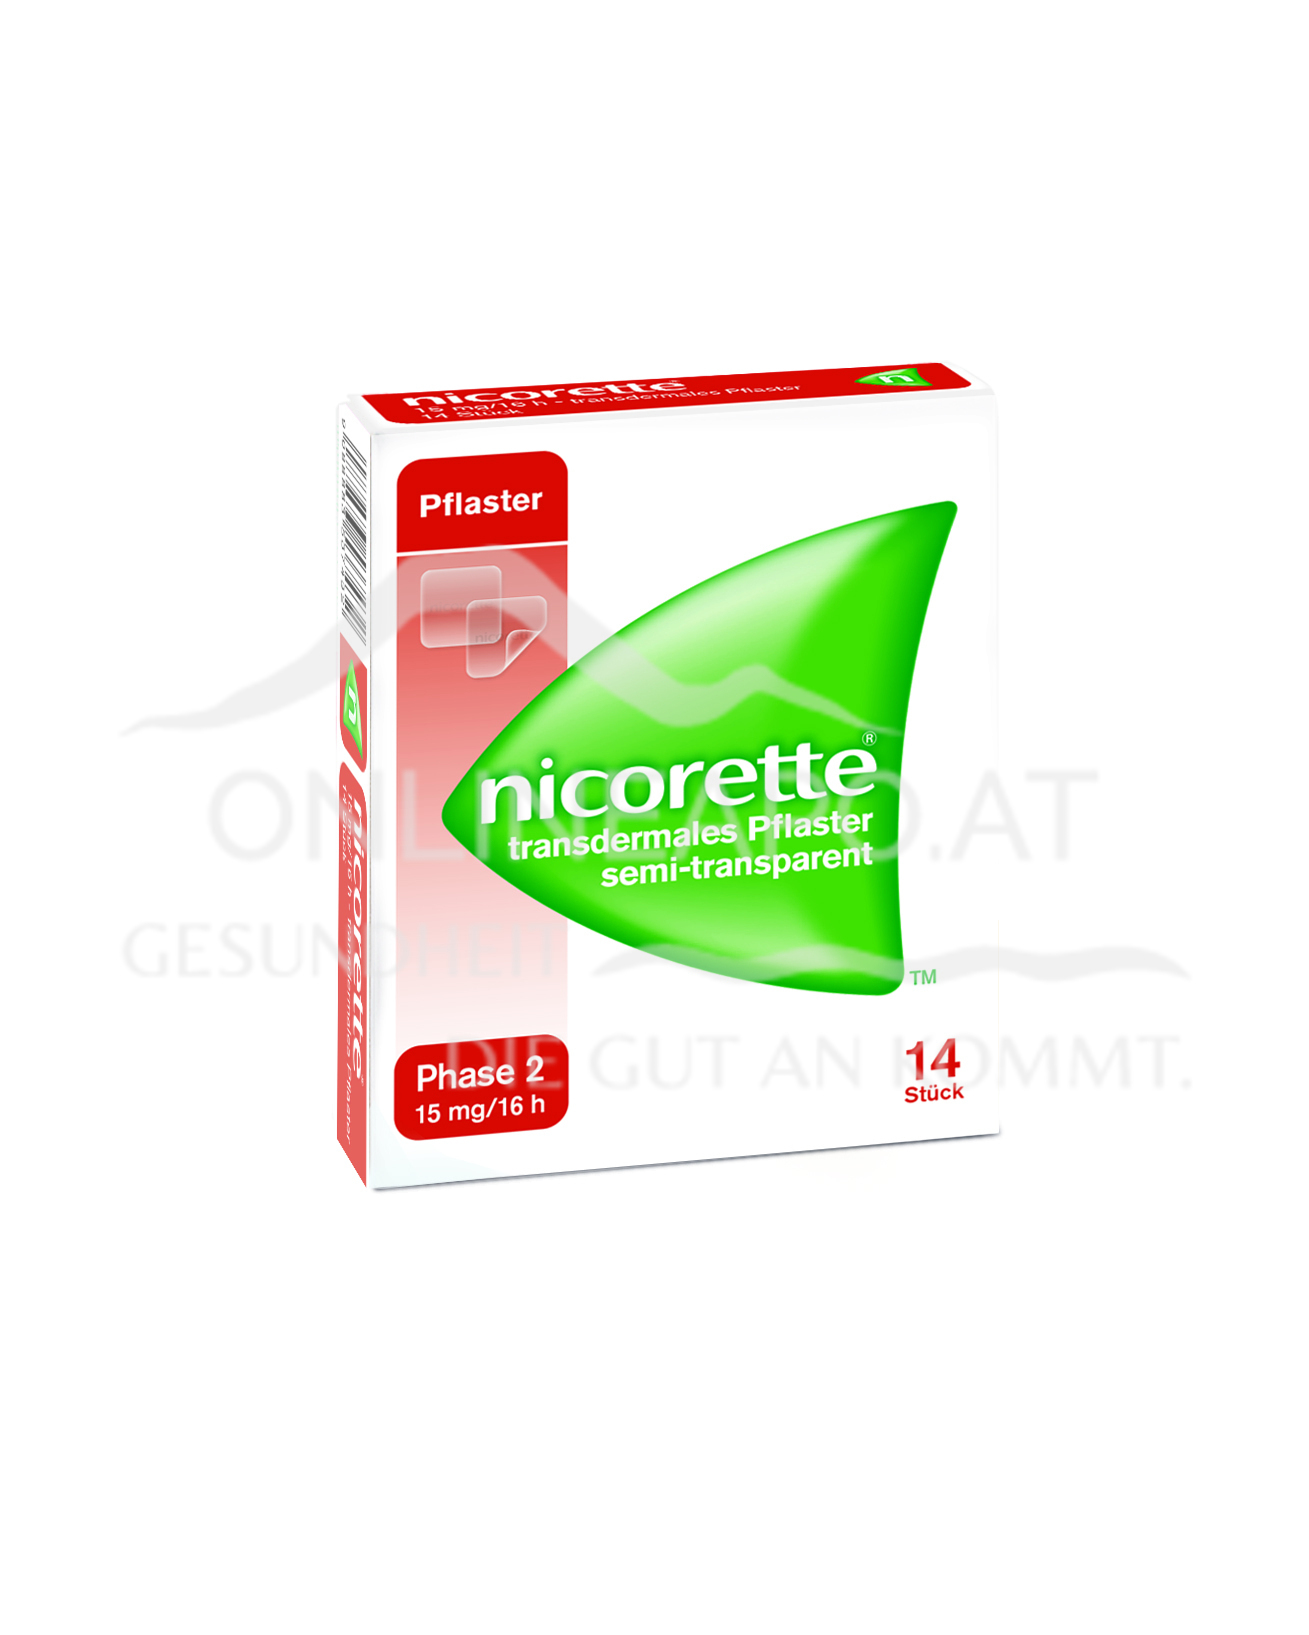 Nicorette® Transdermales Pflaster 15mg/16h